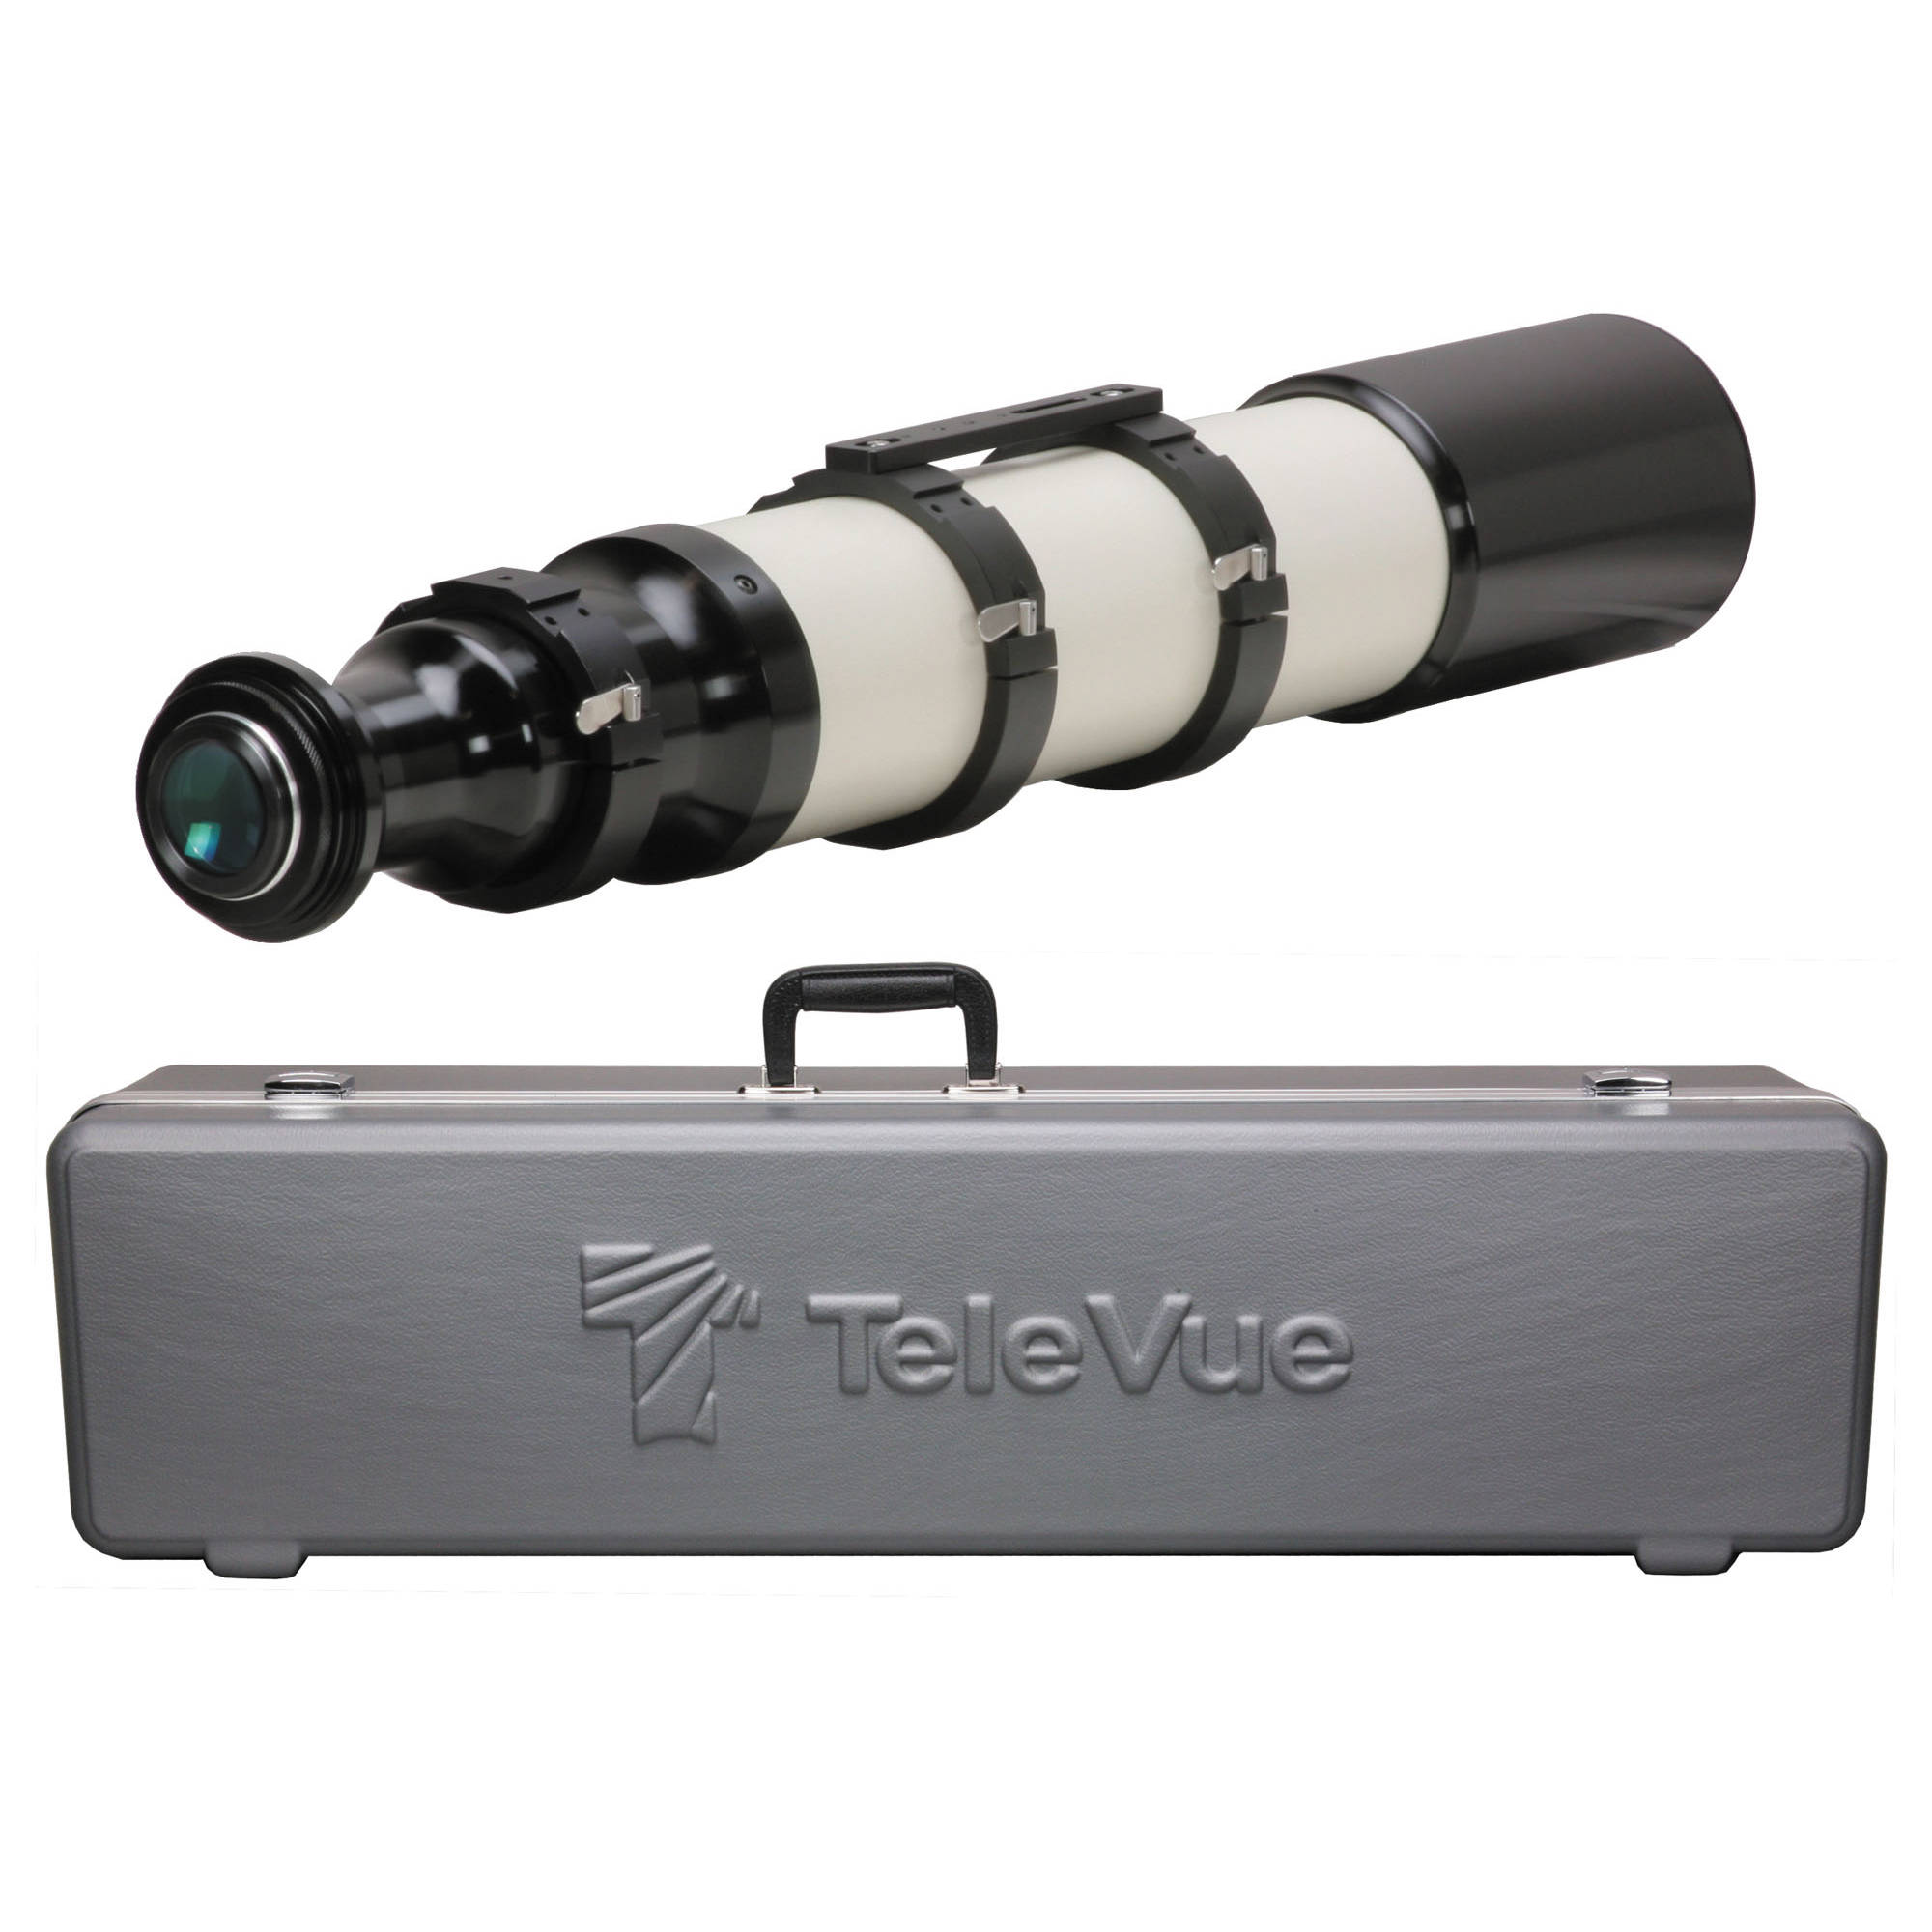 Https C Product 1061827 Reg Pc Camera M Tech 5mp Wb 100 Tele Vue Npf 5055 Np127fli F 5 3 Astrograph 1063070